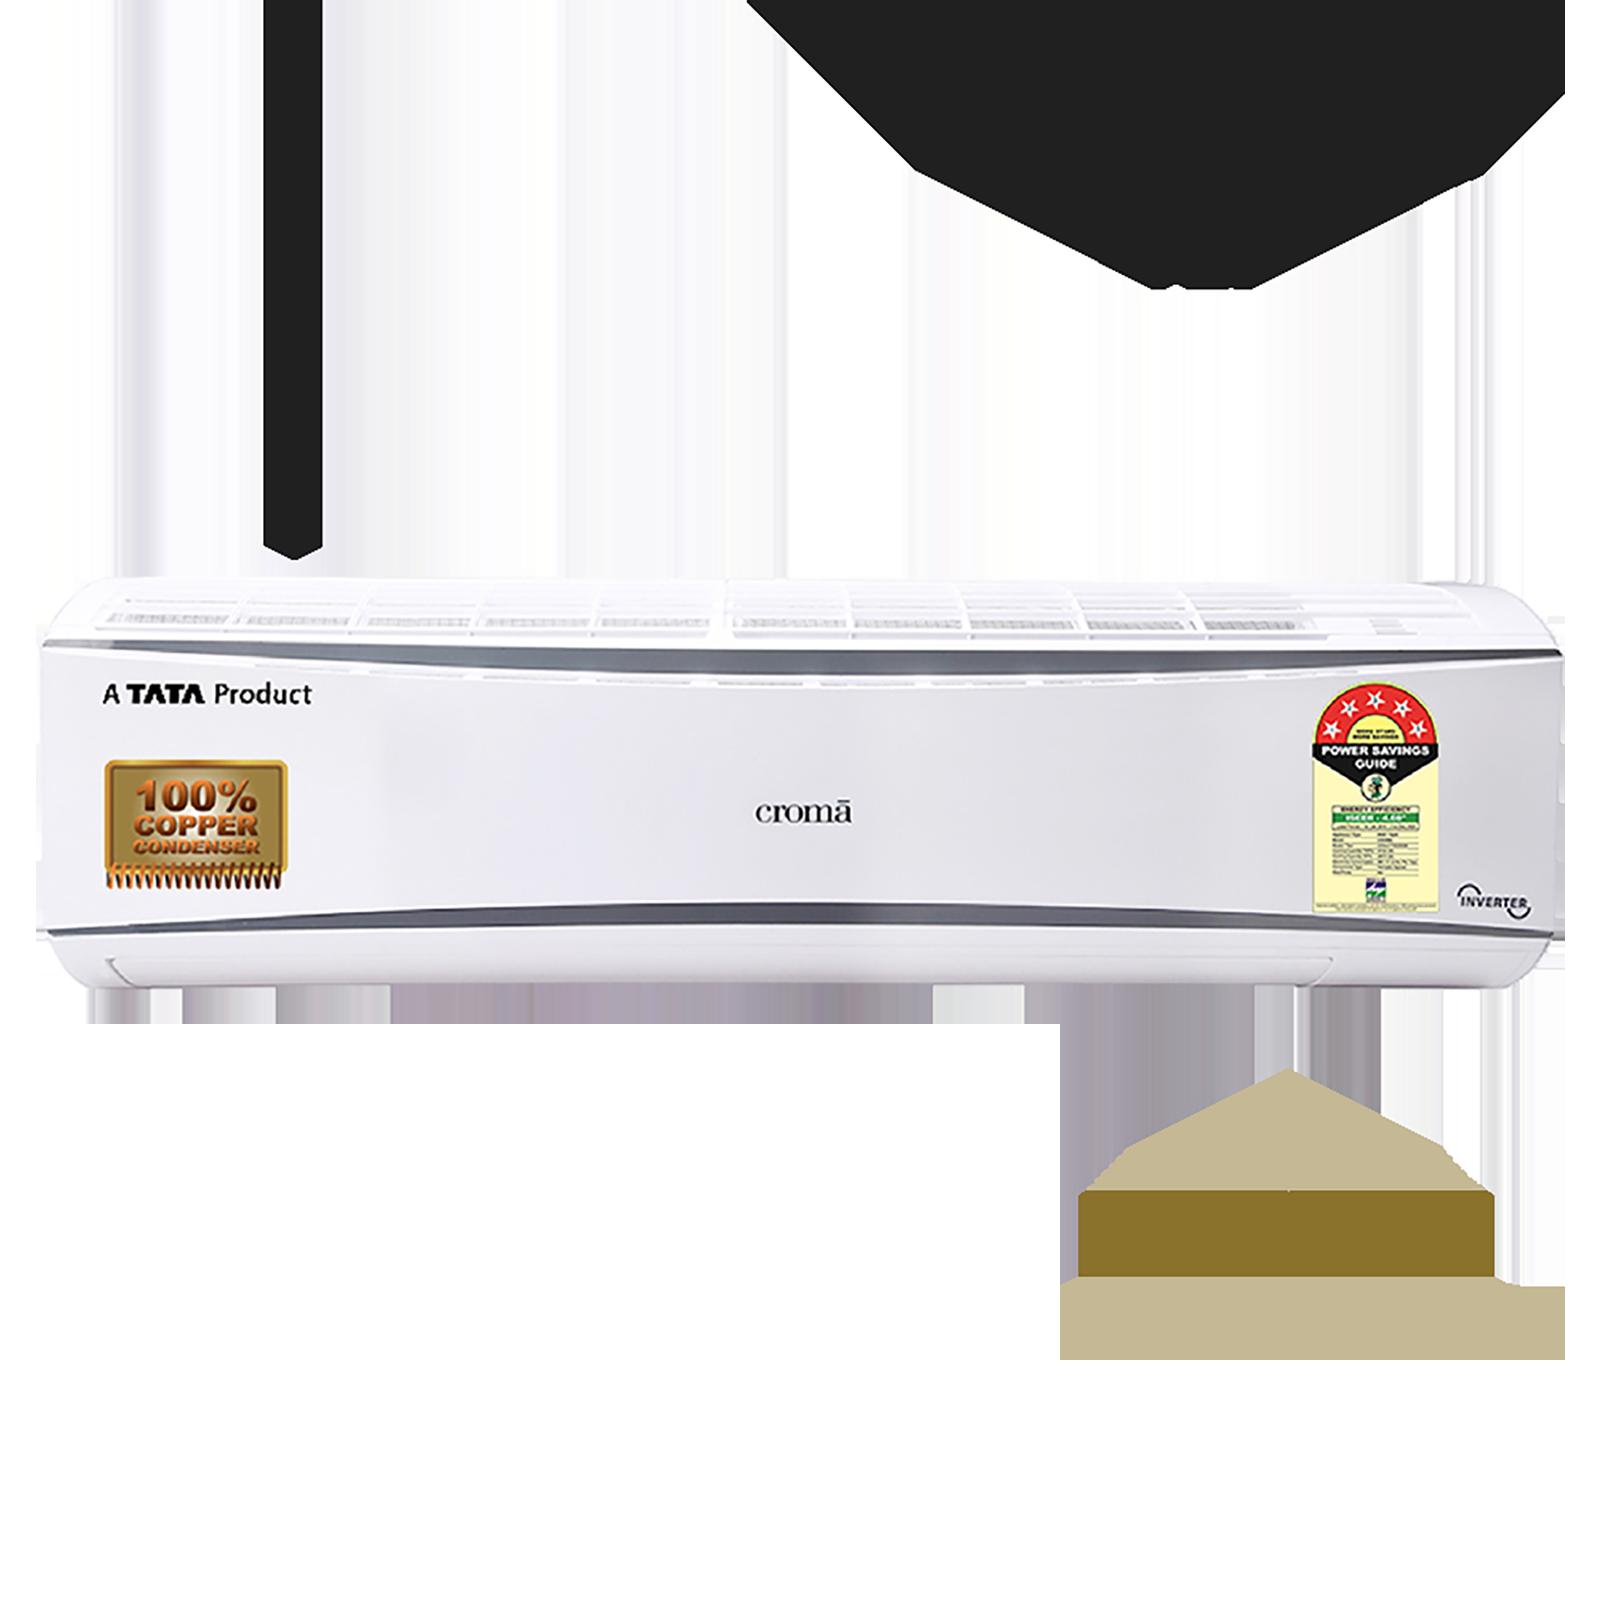 Croma 1.5 Ton 5 Star Inverter Split AC (Copper Condenser, CRAC7705, White/Cool Grey)_1